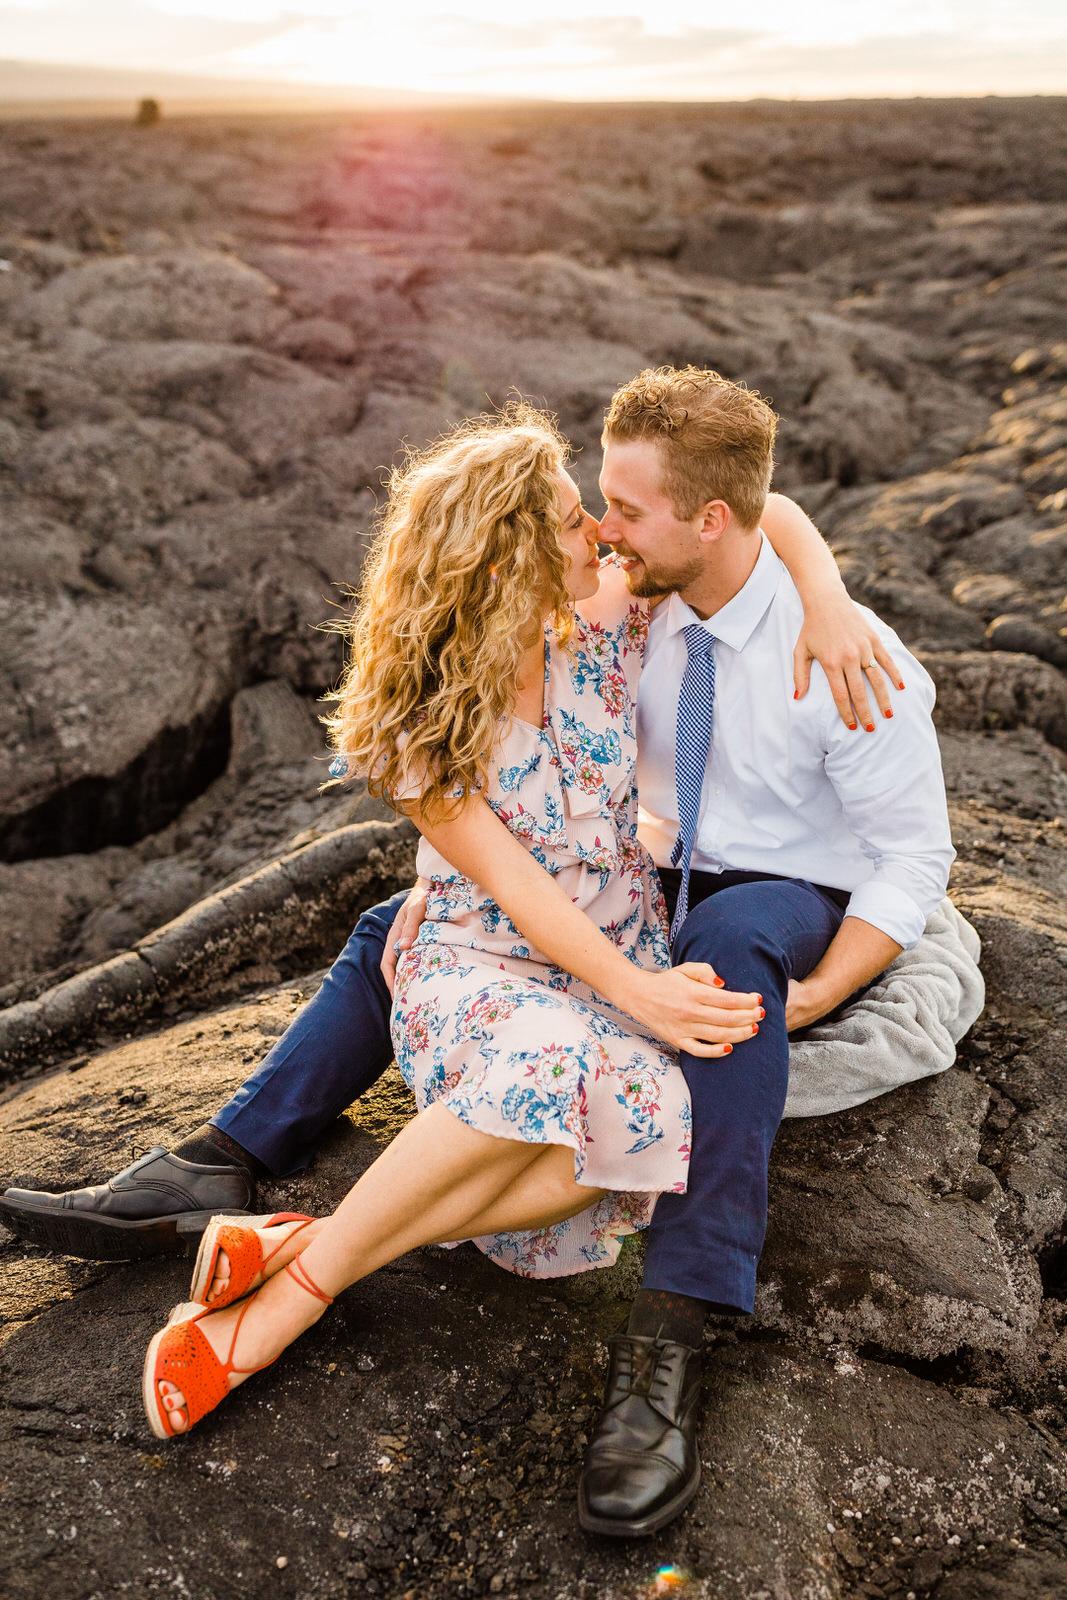 engagements-hilo-happy-couple-big-island-hawaii-12.jpg